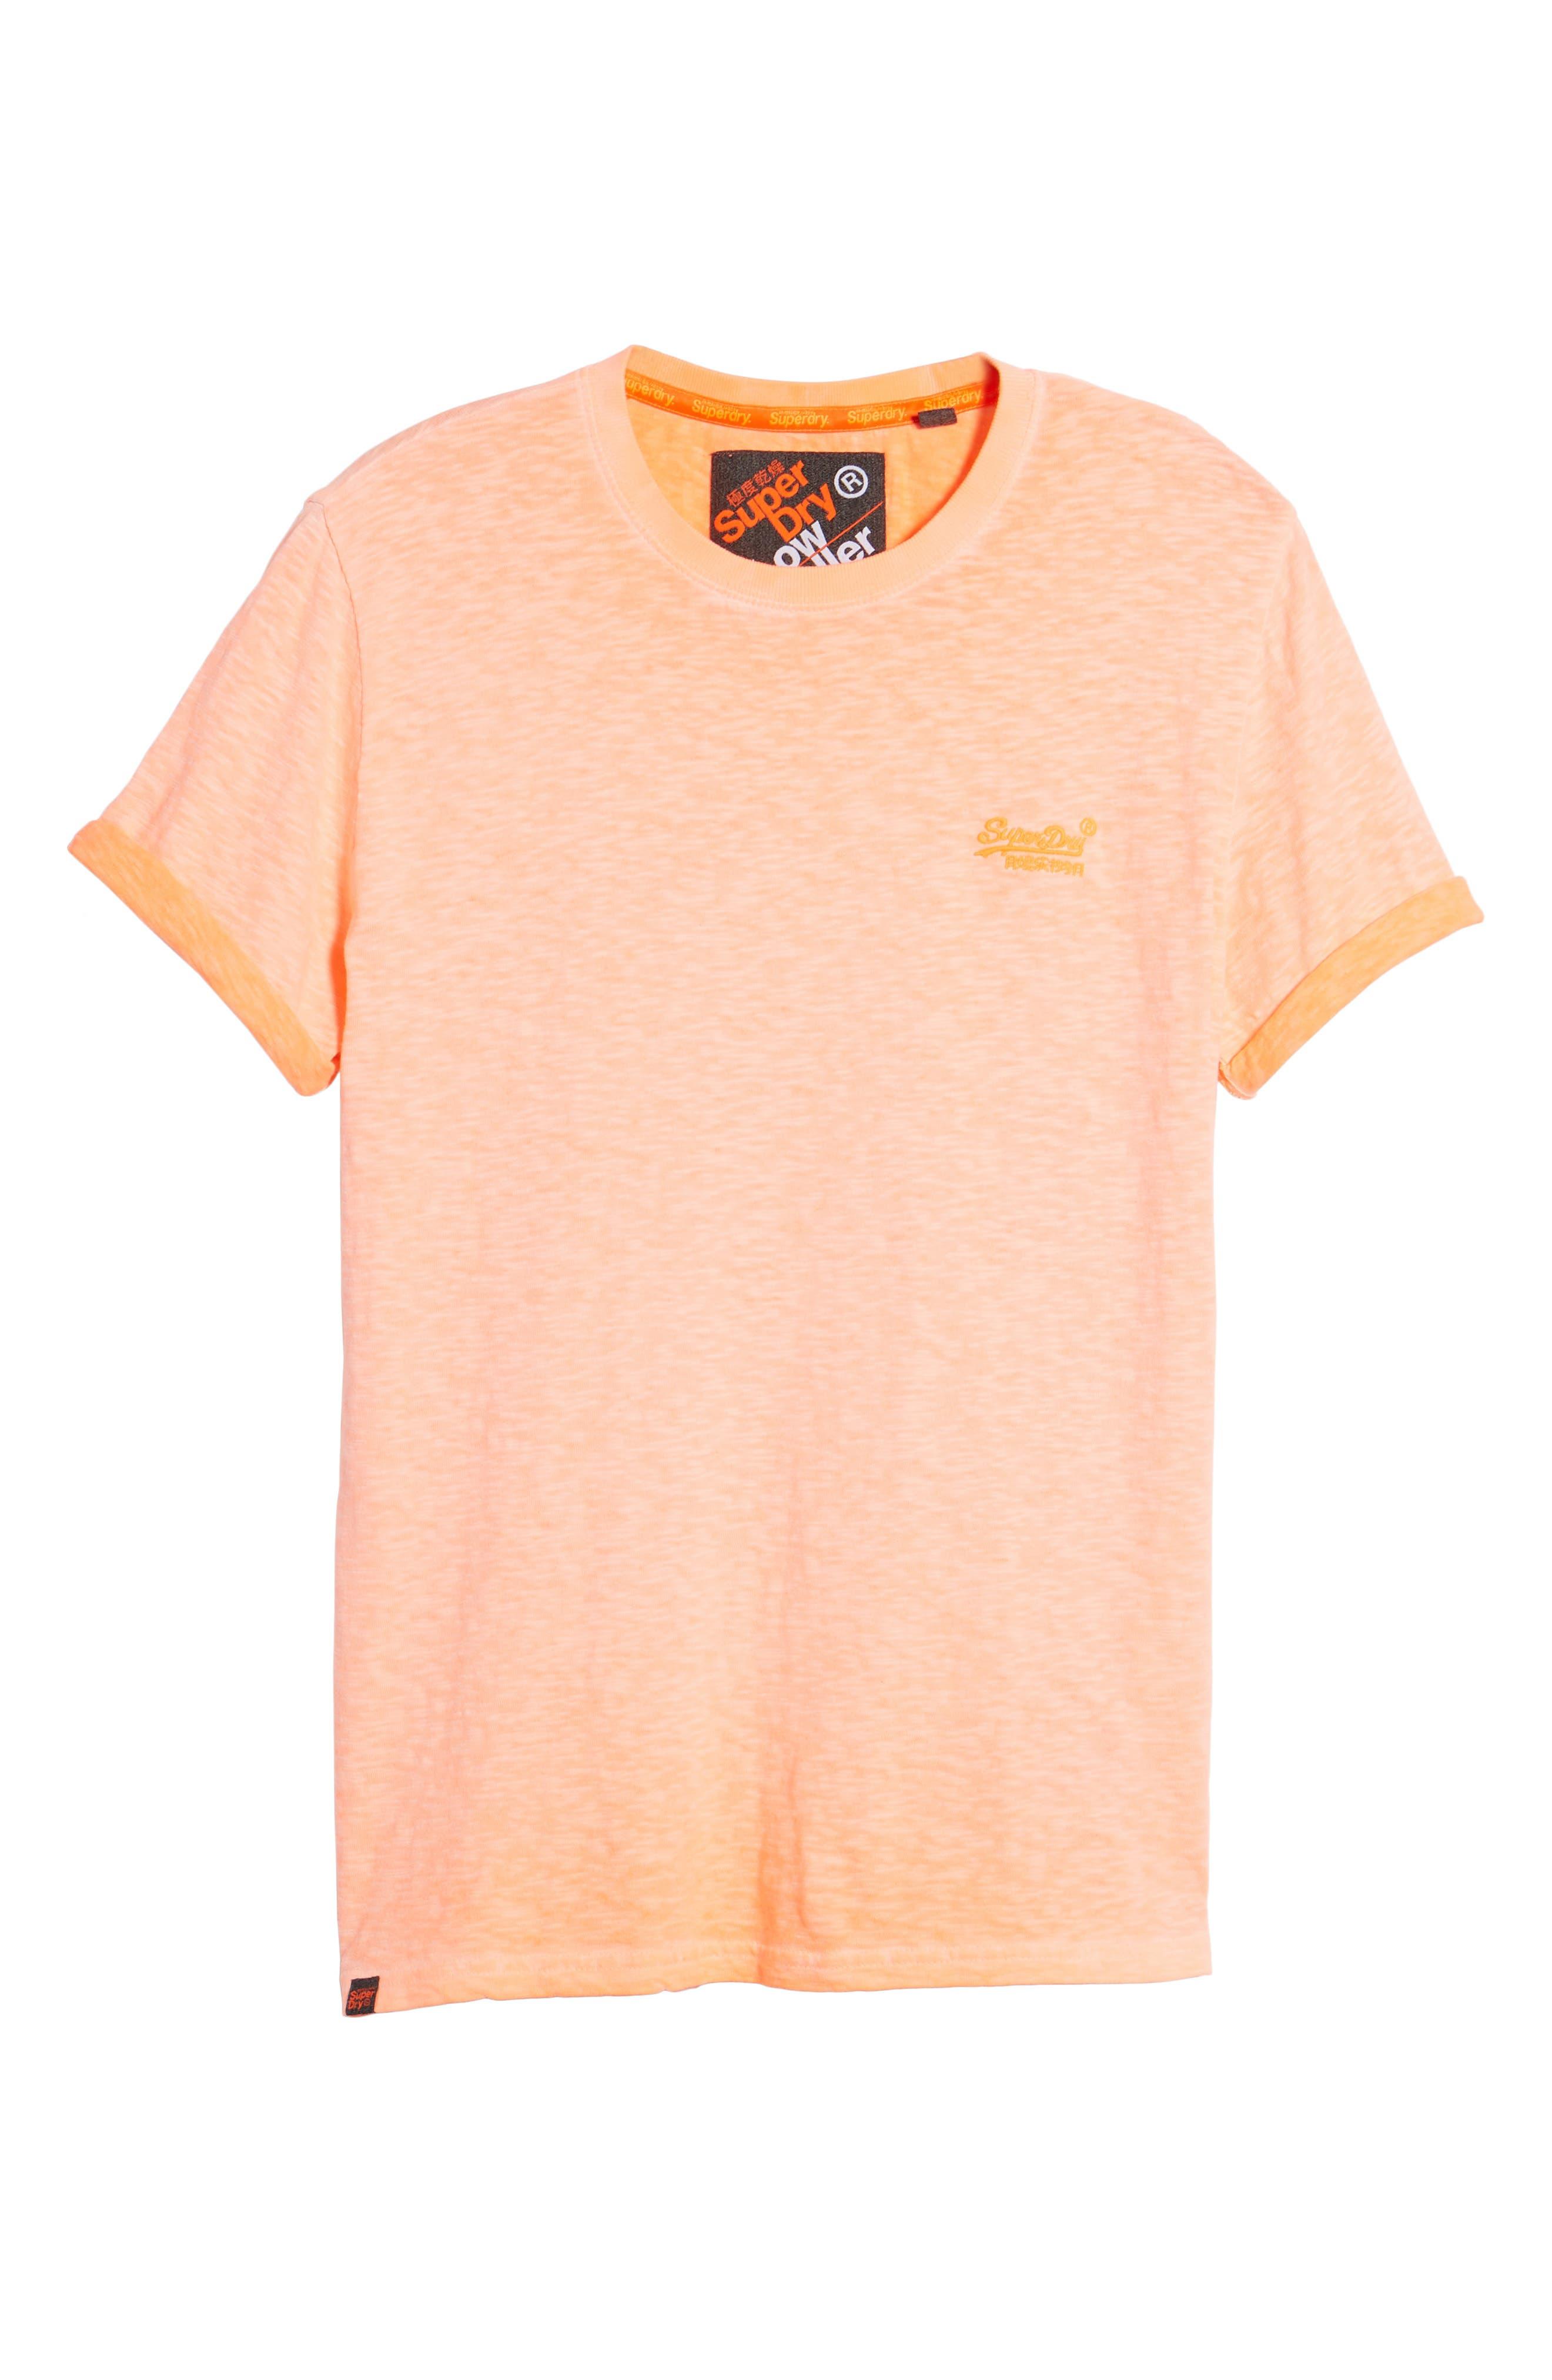 Orange Label Low Roller T-Shirt,                             Alternate thumbnail 30, color,